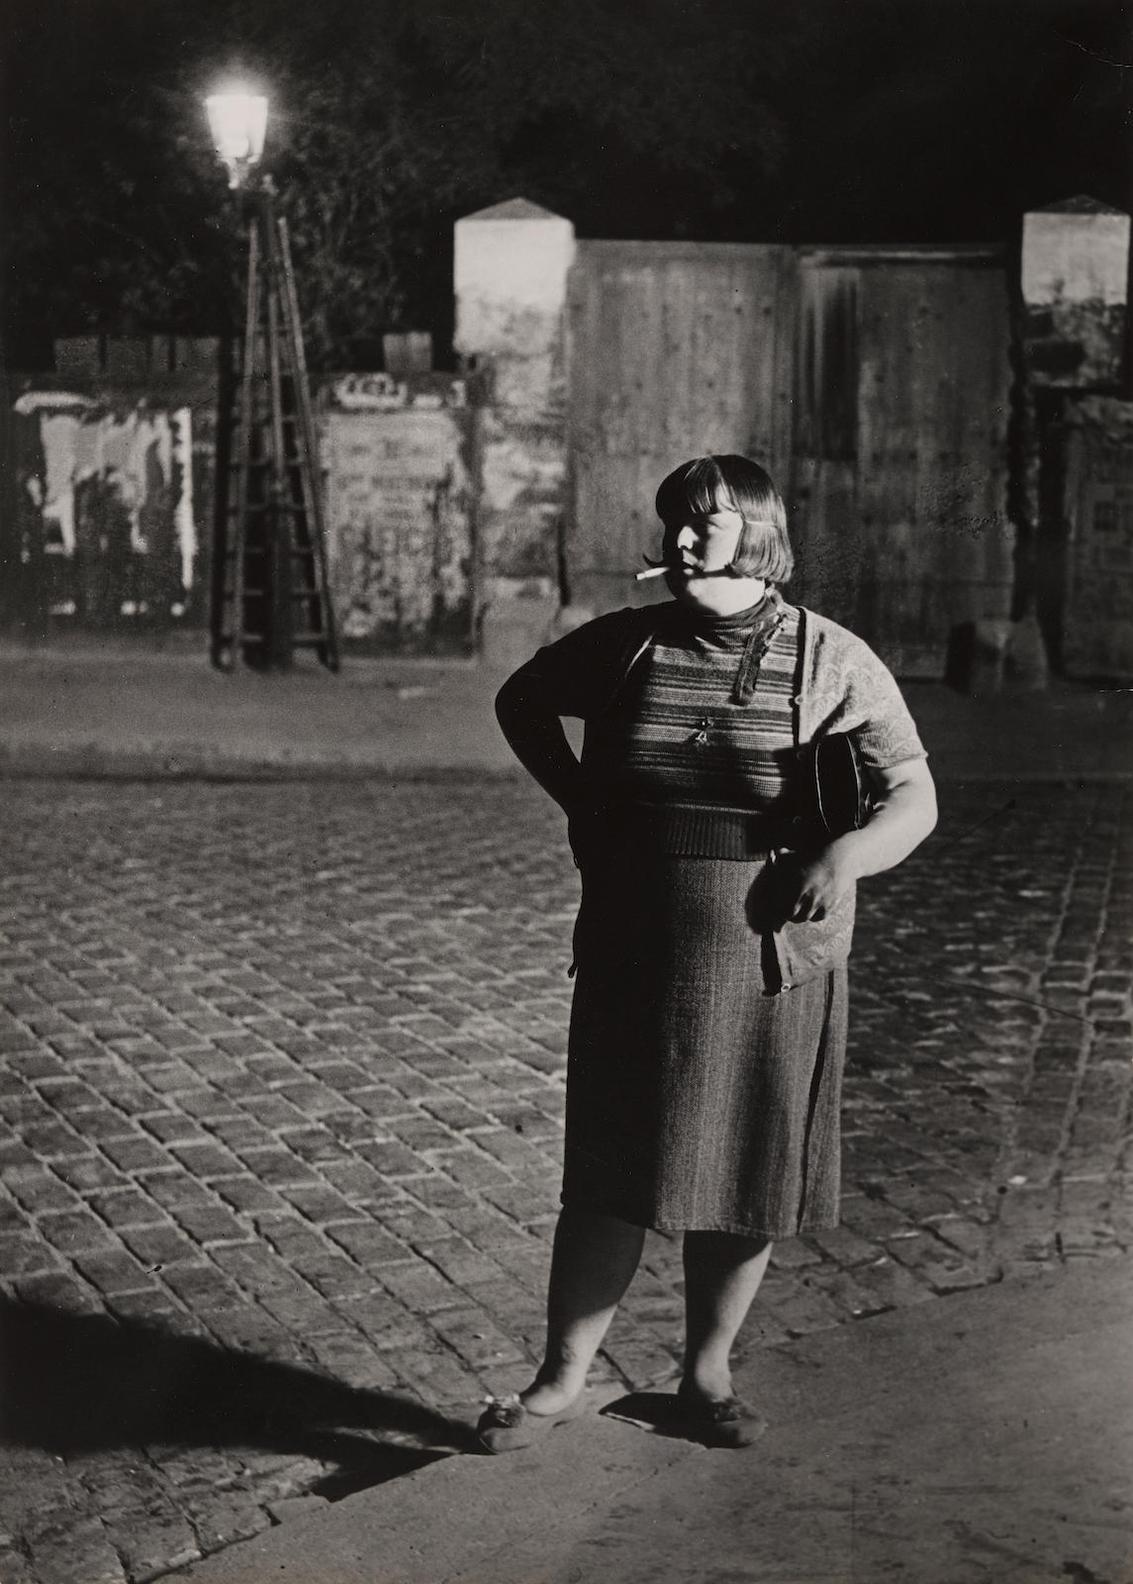 Brassai-Fille De Joie, Quartier Italie-1932